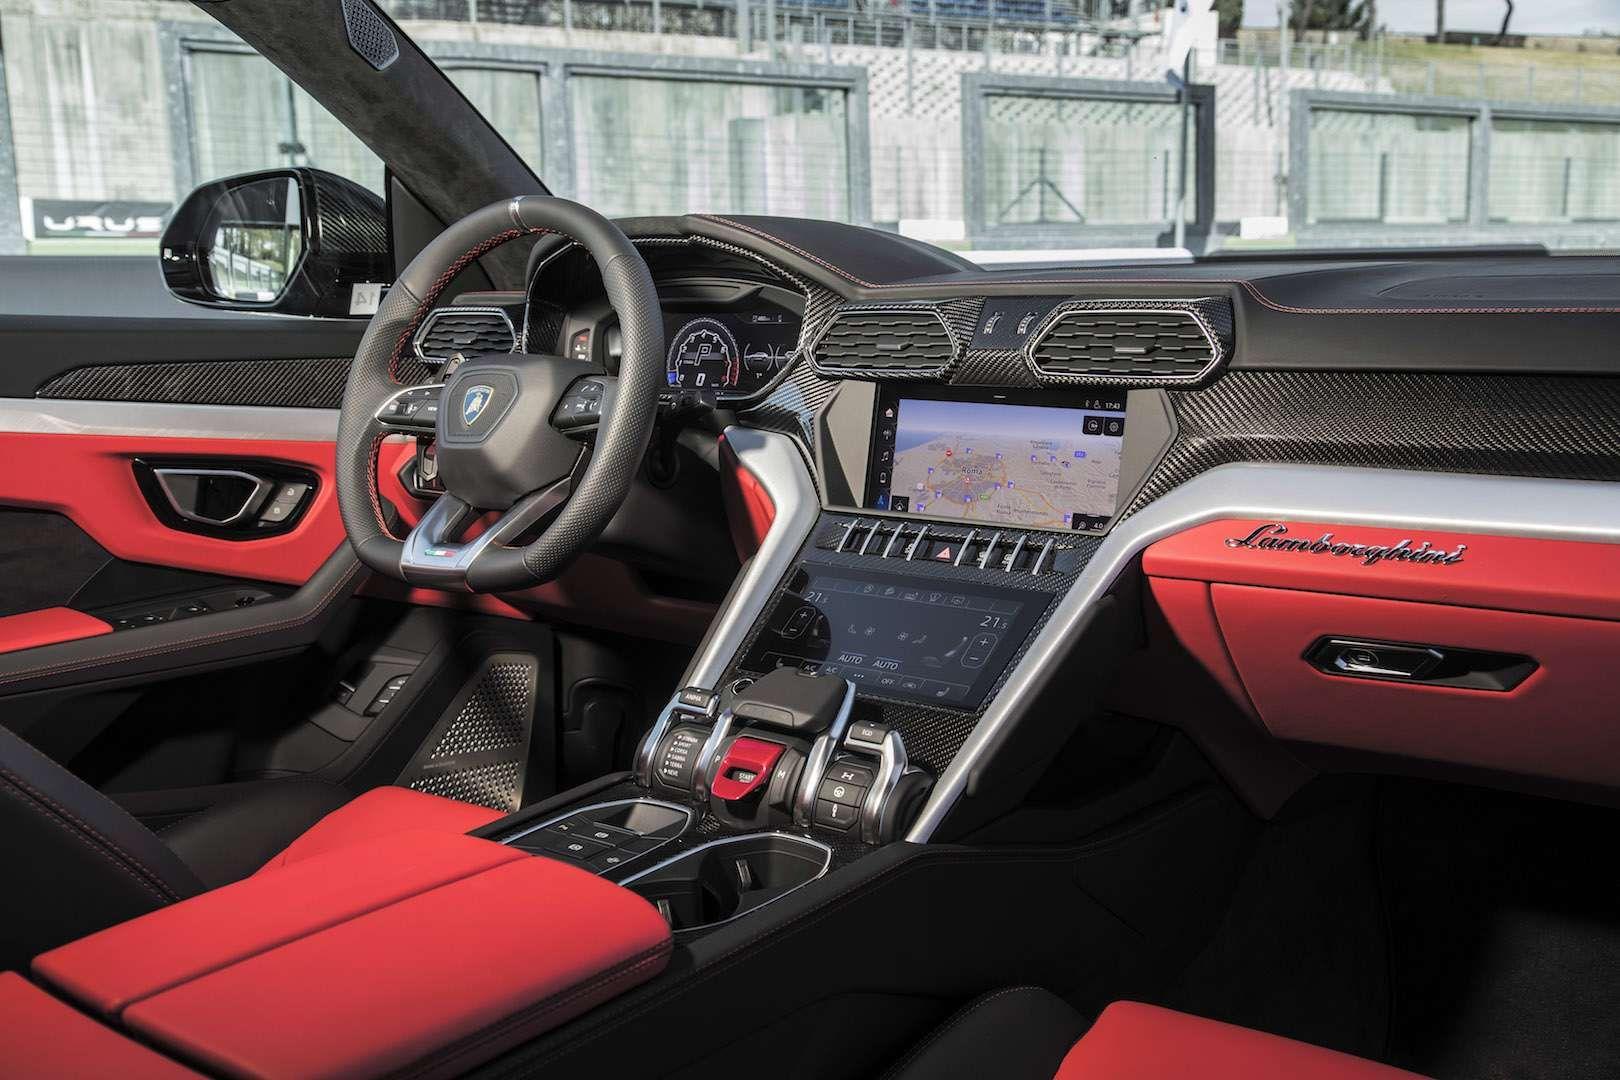 Lamborghini Urus First Drive Review in Italy: Lambo Sets a